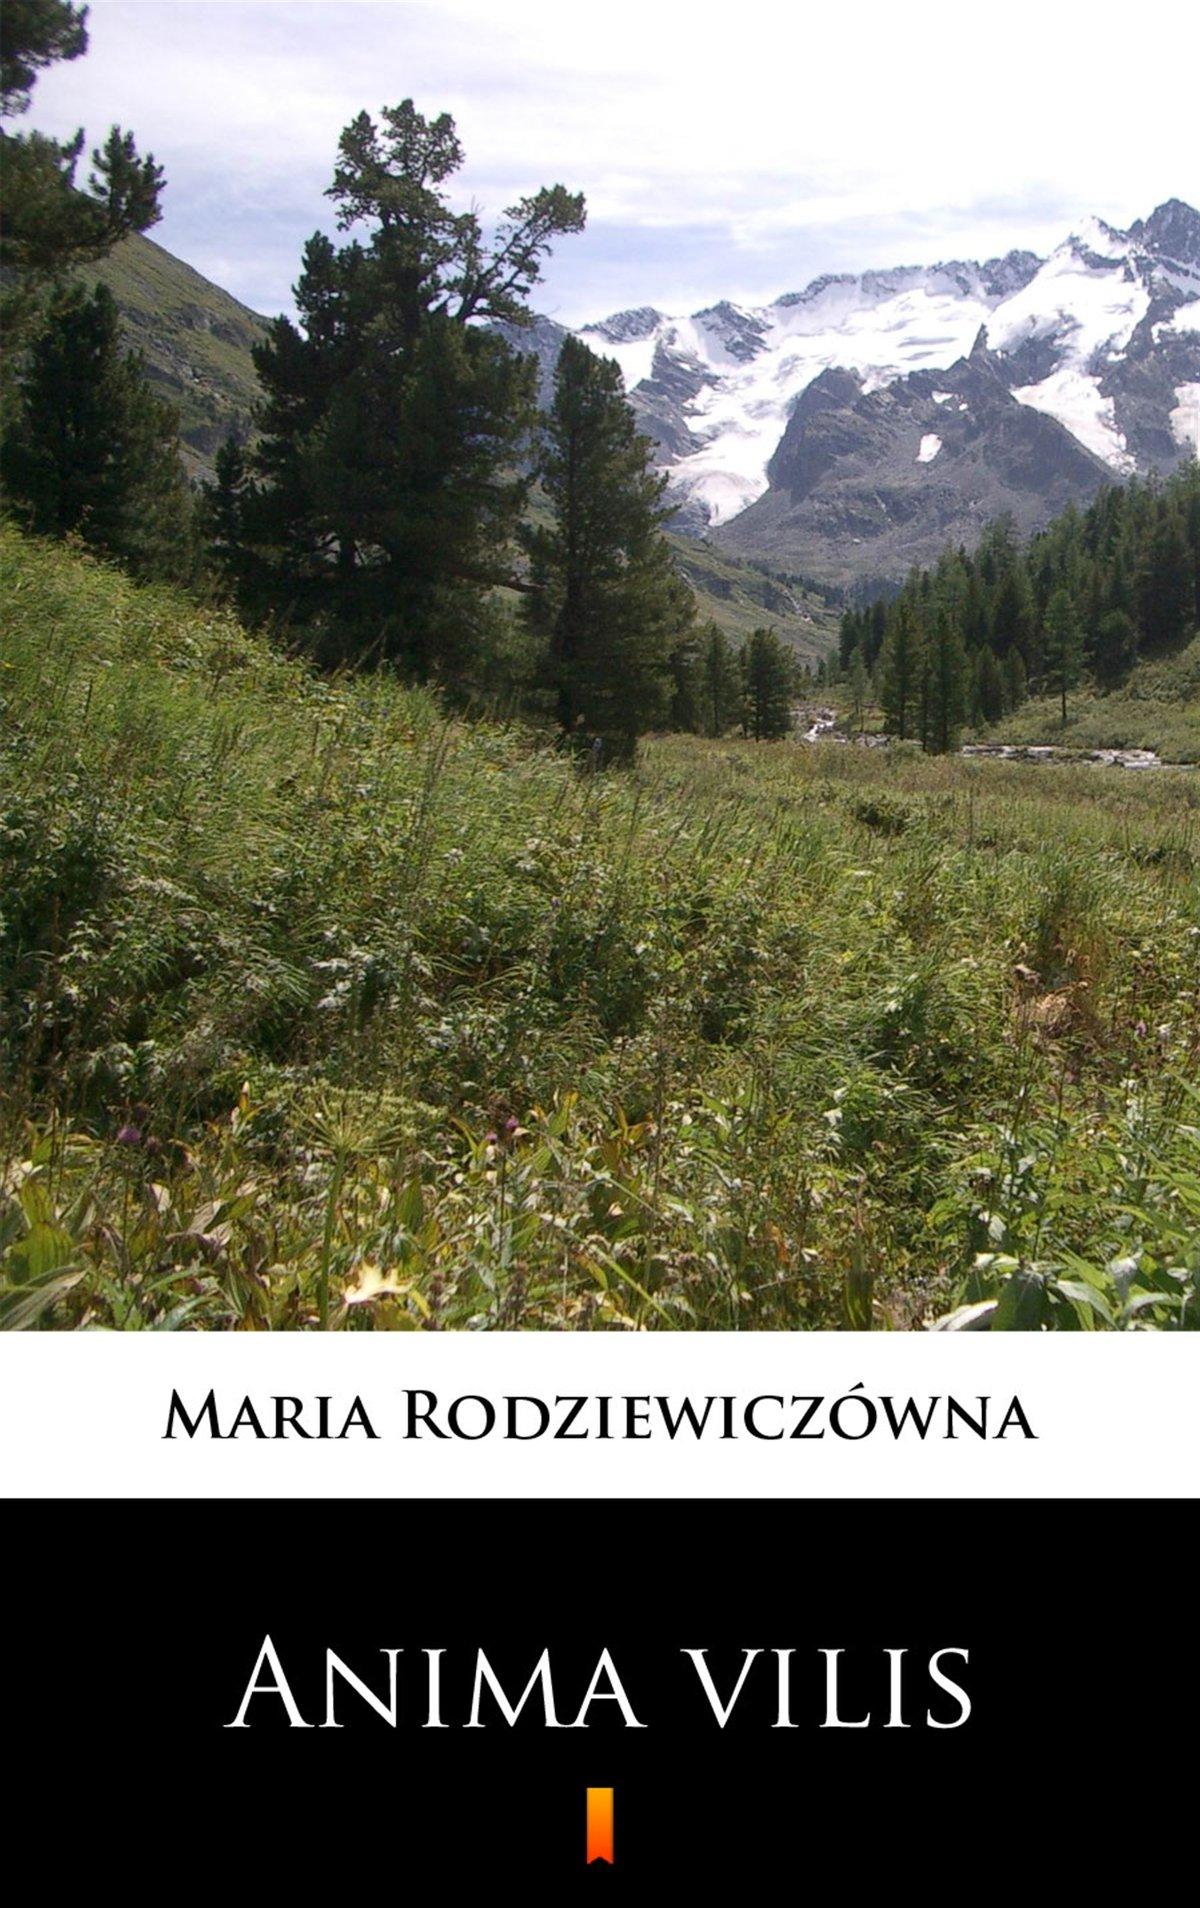 Anima vilis - Ebook (Książka EPUB) do pobrania w formacie EPUB